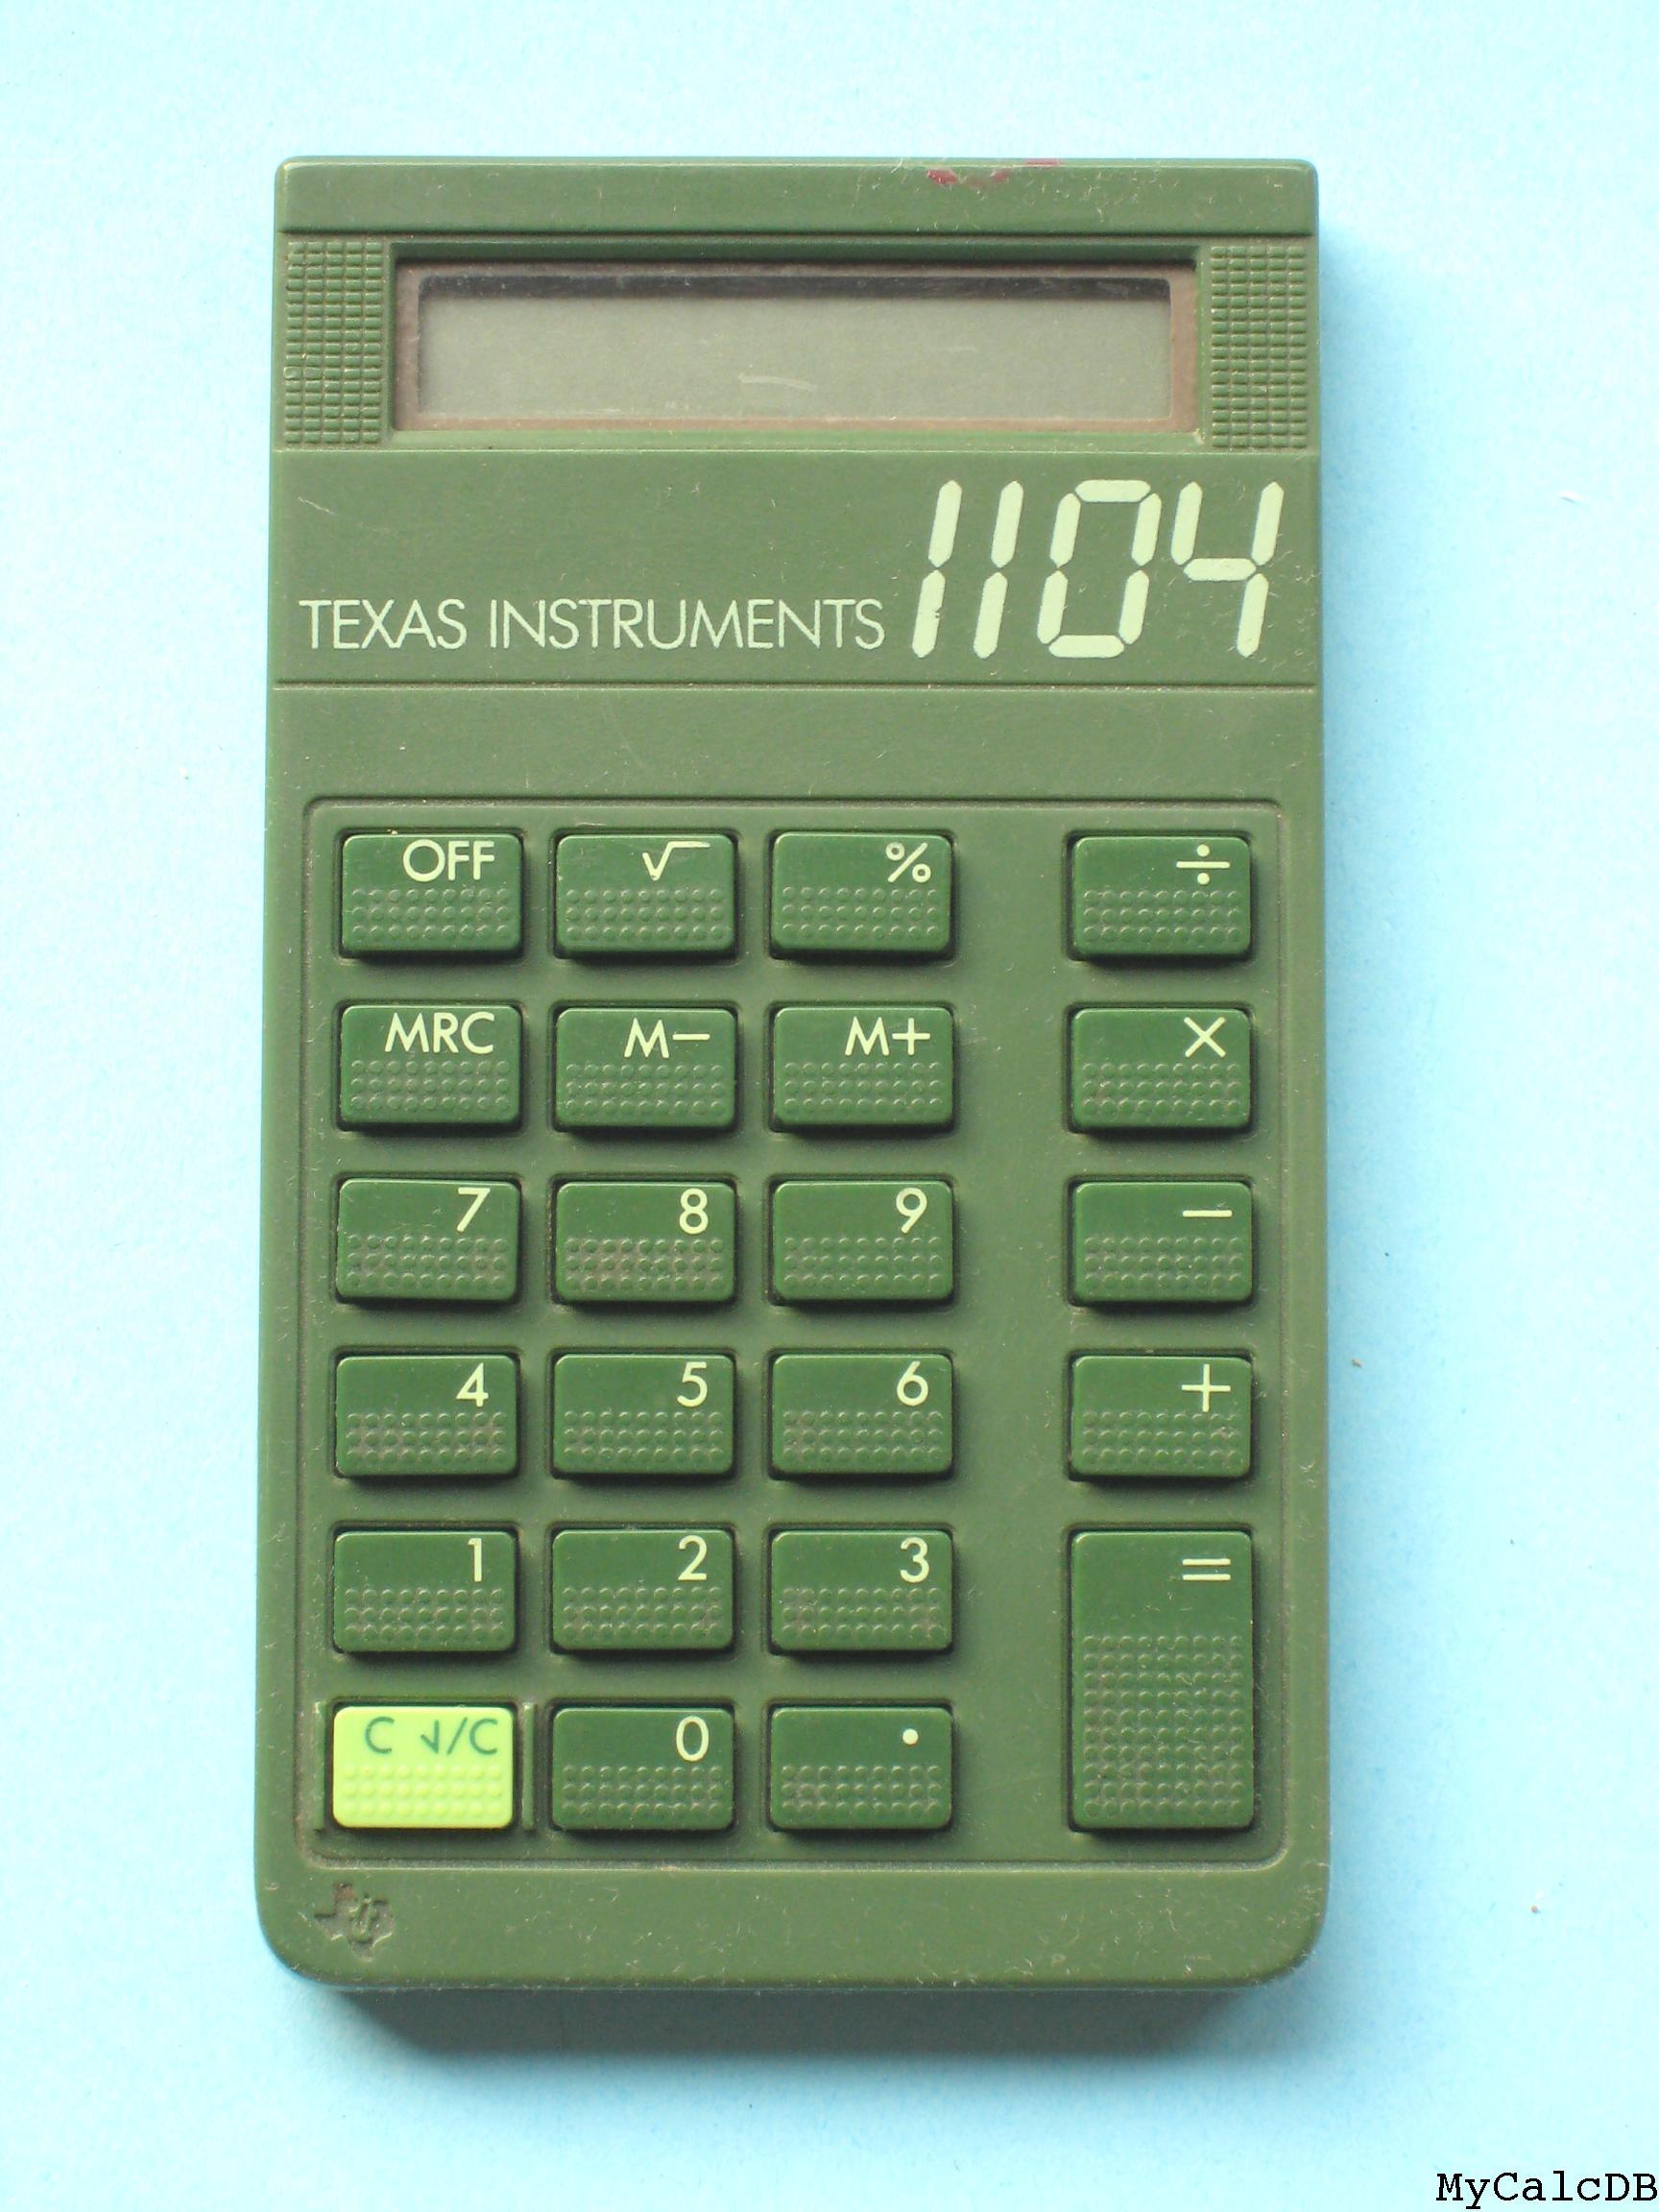 http://mycalcdb.free.fr/galerie/TI/texas-instruments.TI-1104.version1.2.jpg